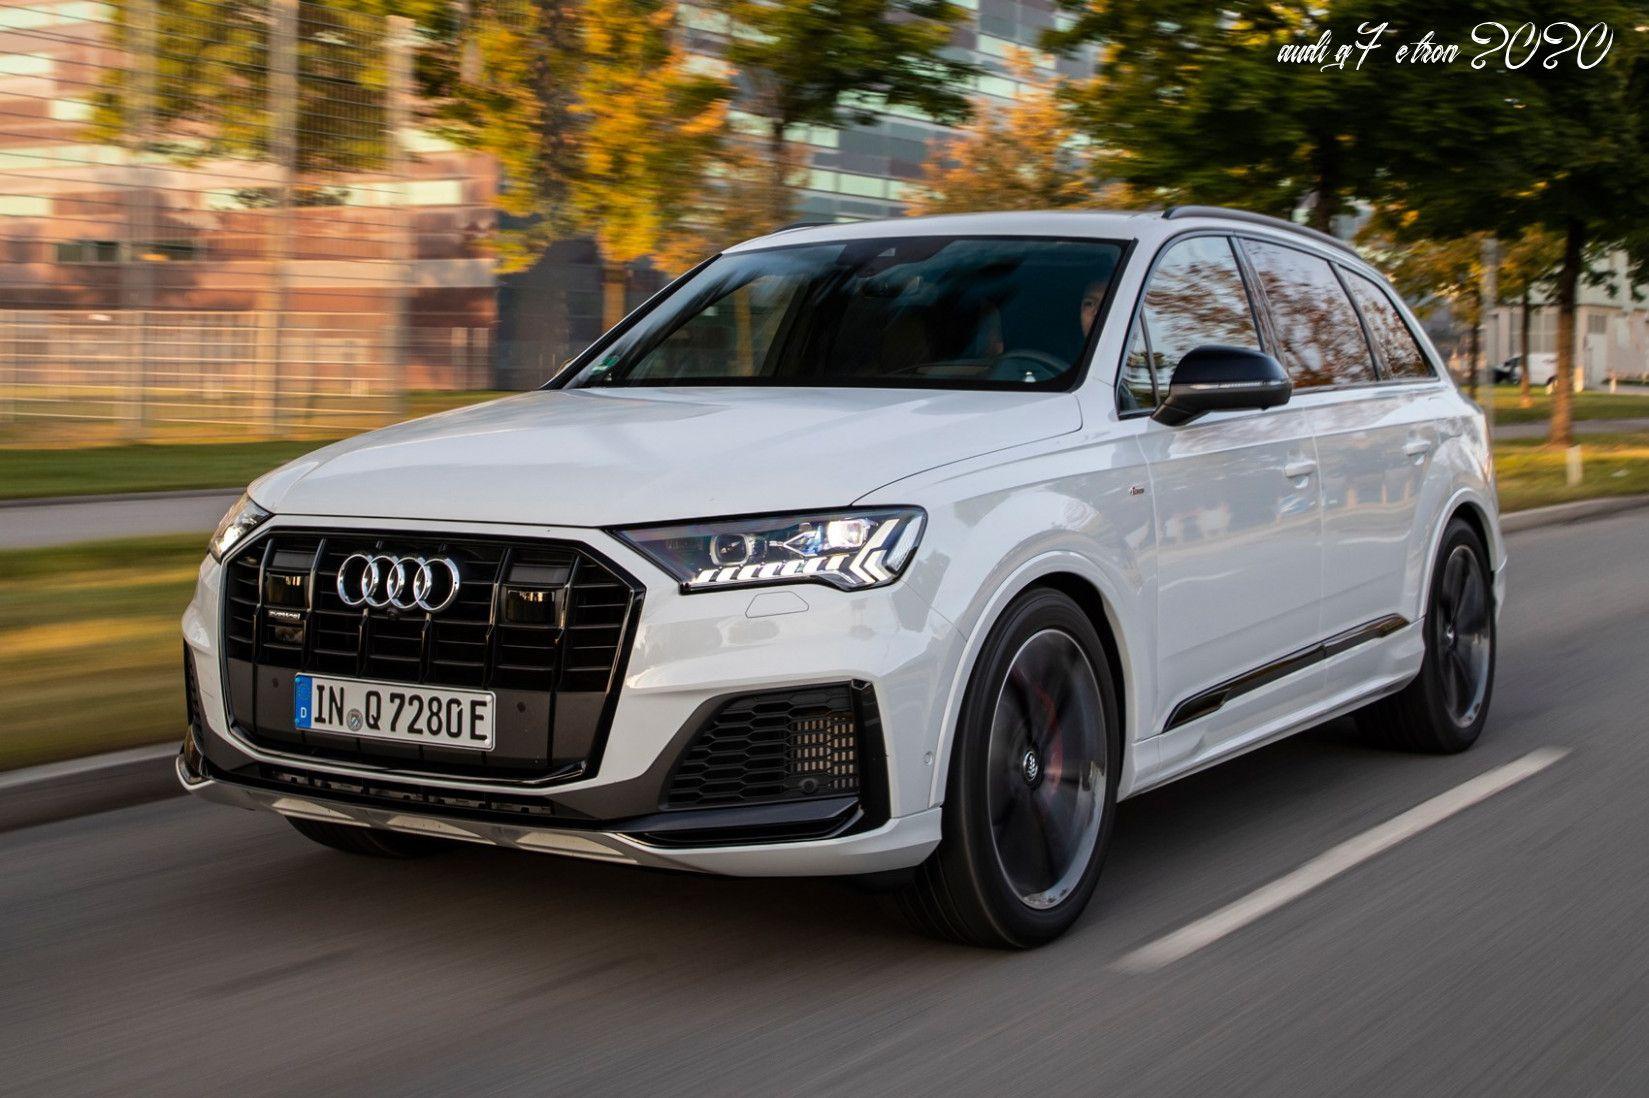 Audi Q7 E Tron 2020 Review And Release Date Audi Q7 Audi New Audi Q7